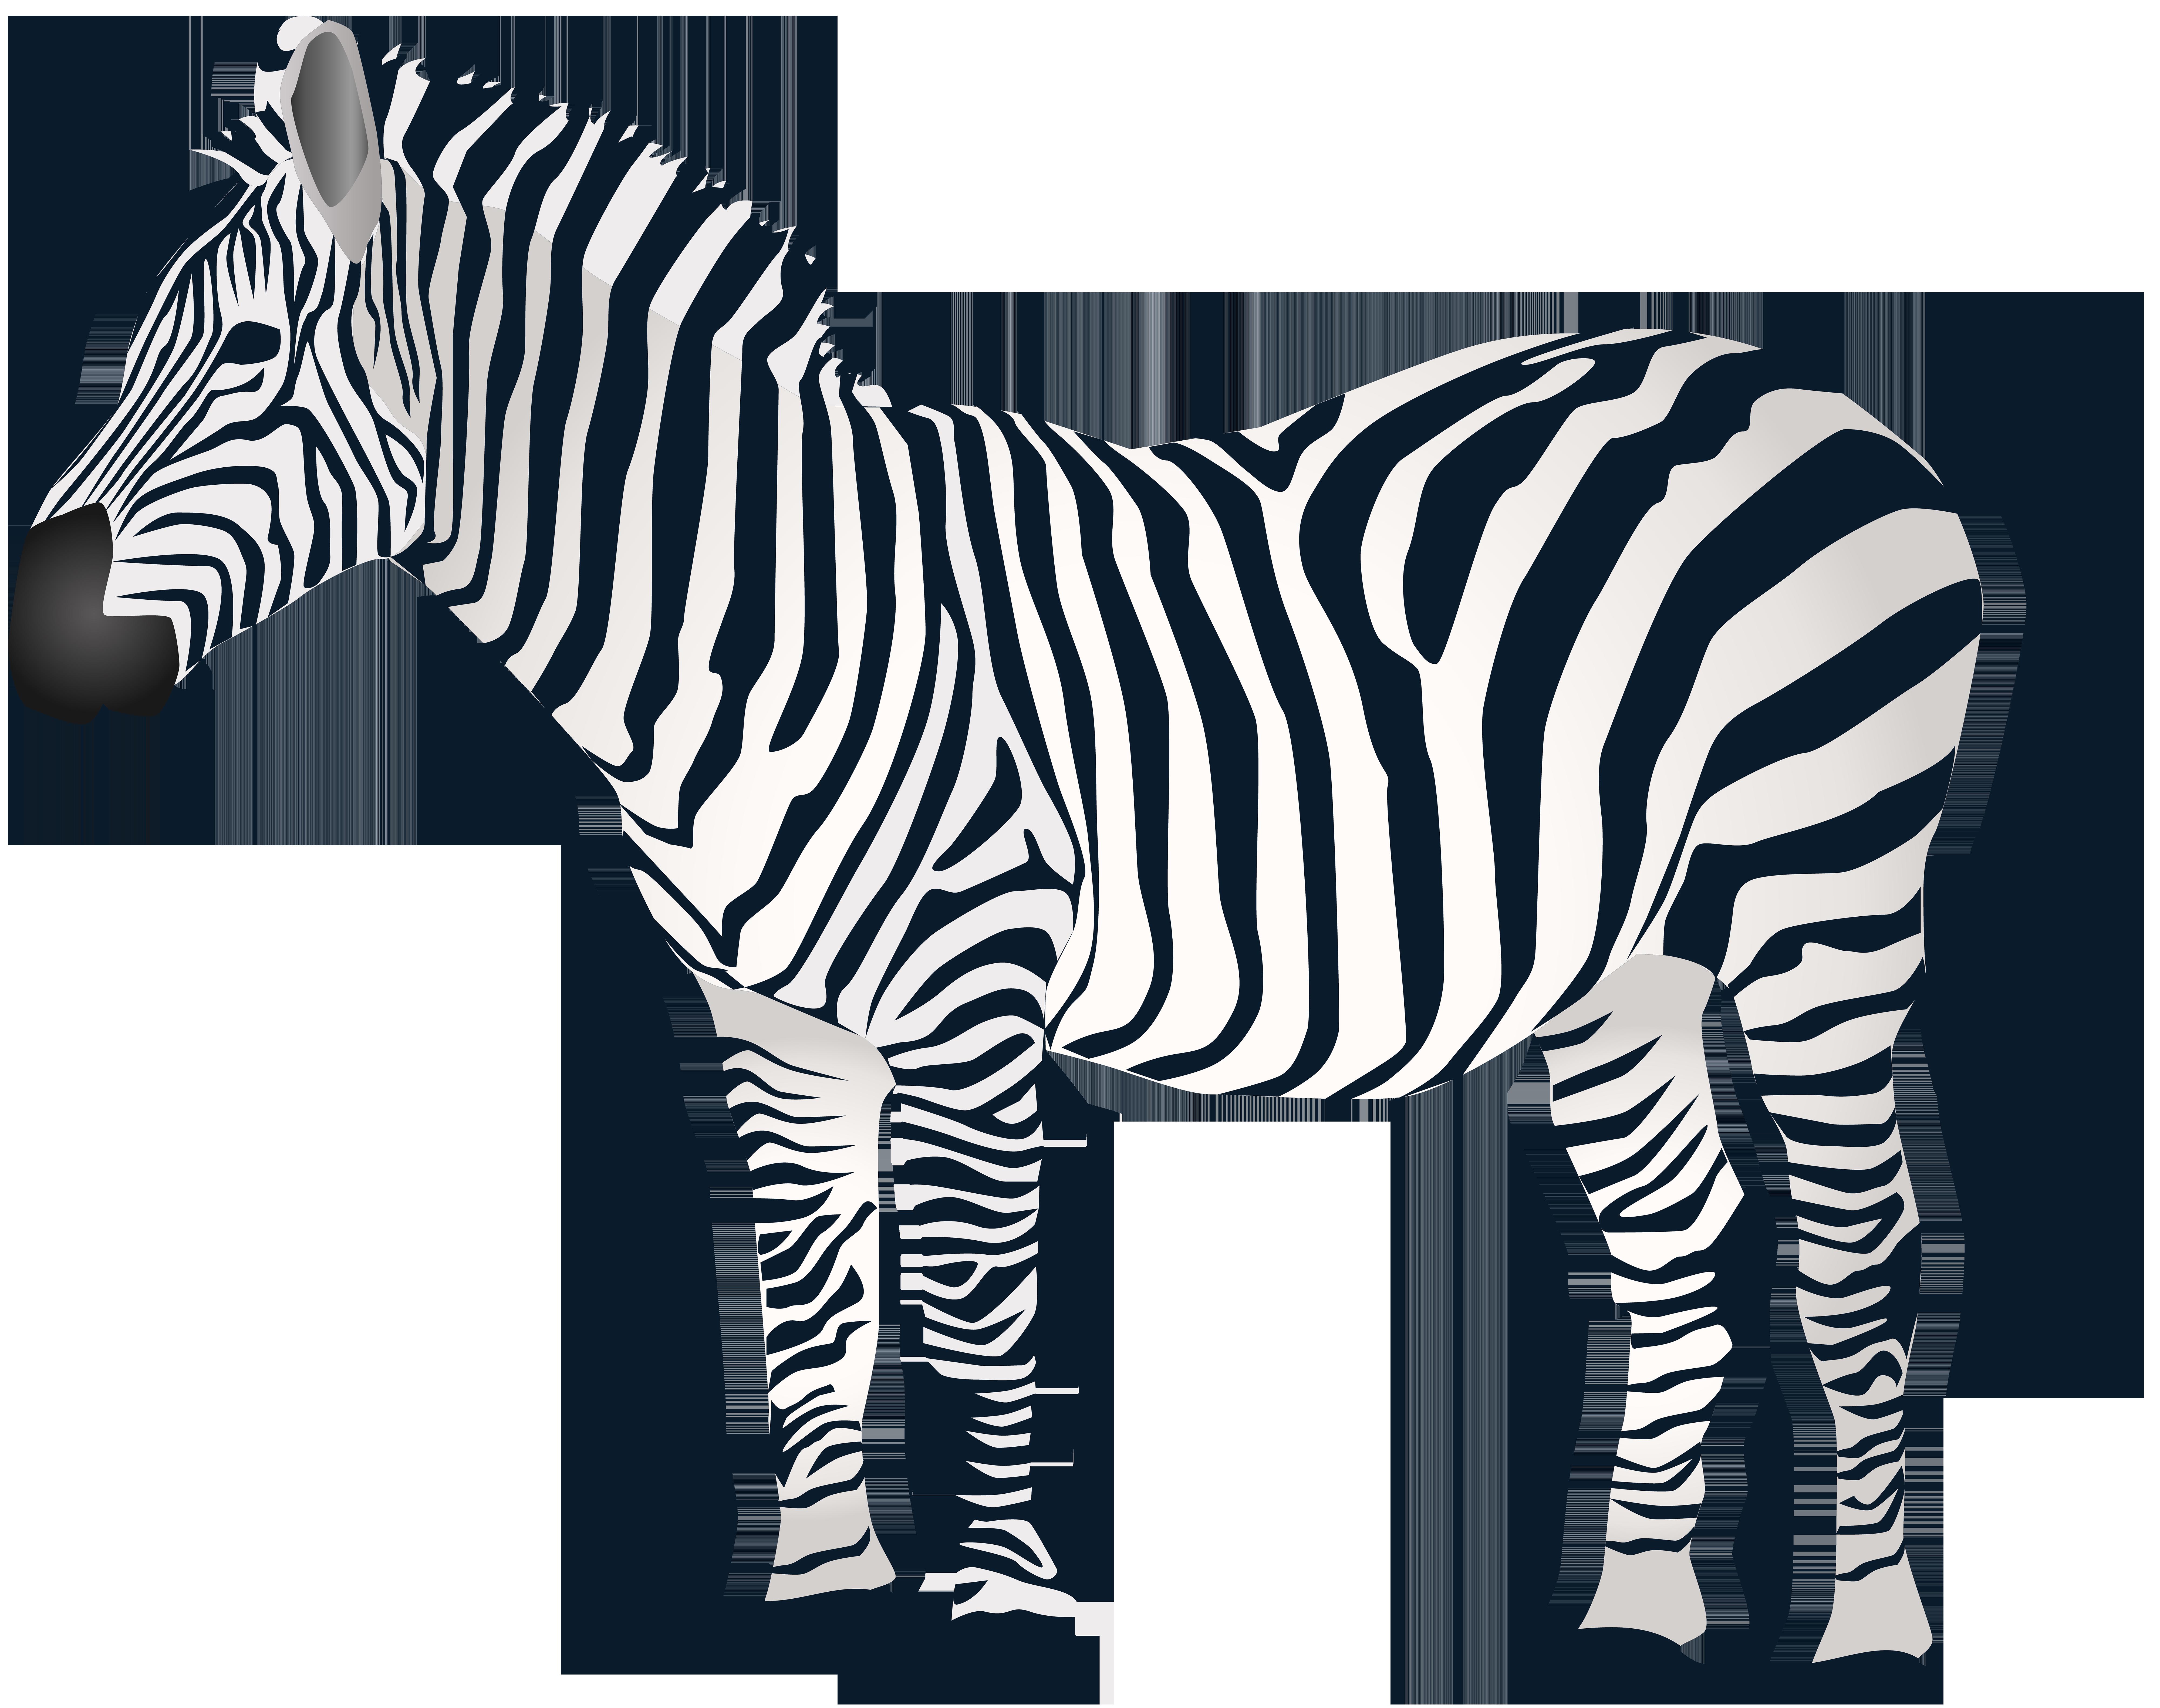 8000x6326 Zebra Png Clip Artu200b Gallery Yopriceville